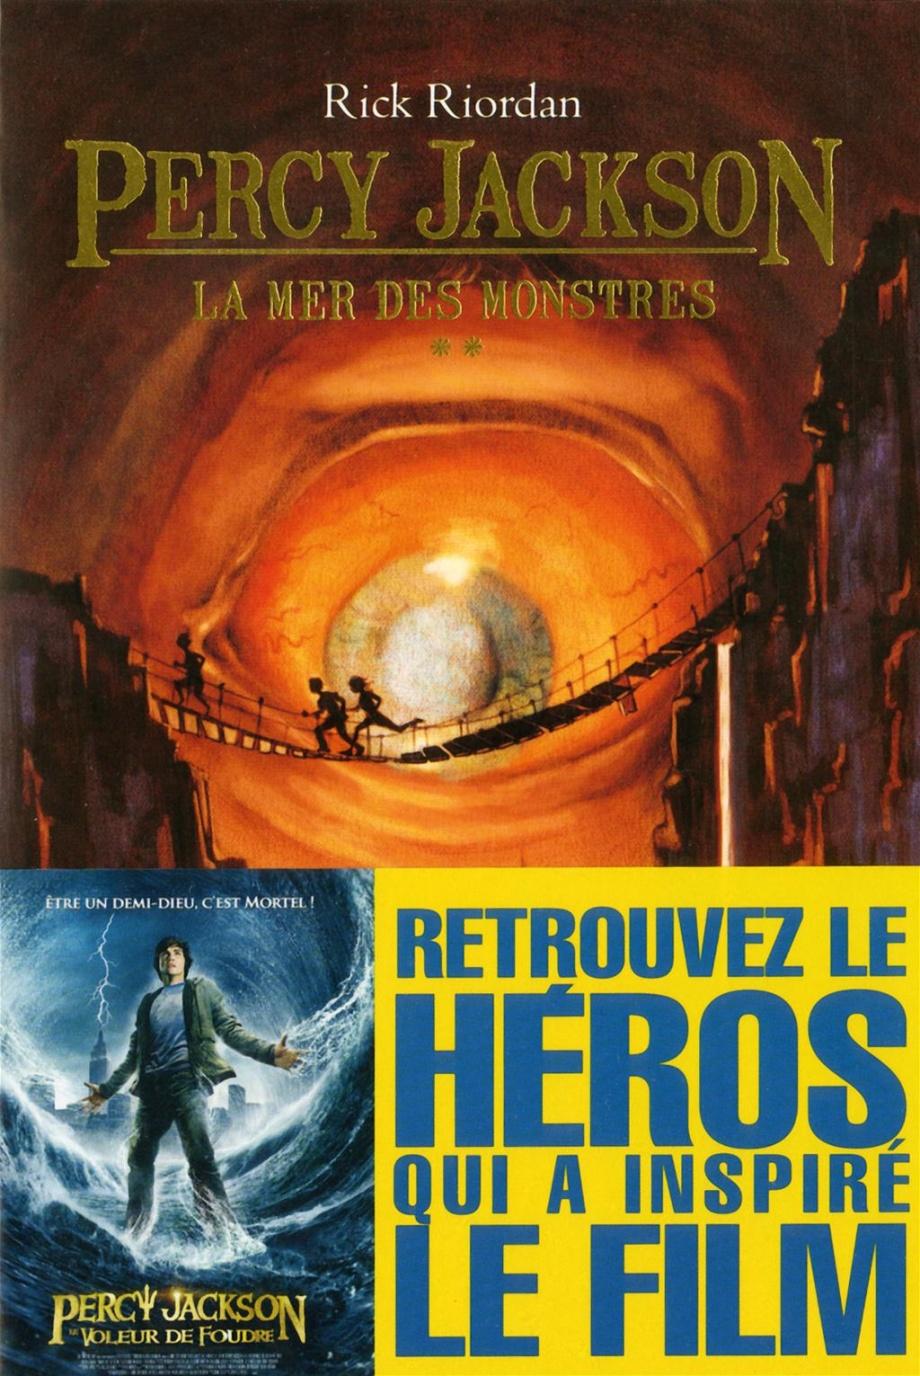 Percy Jackson La Mer Des Monstres : percy, jackson, monstres, Percy, Jackson, Monstres, Riordan, Jeunesse, Romans, 10-14, Leslibraires.ca